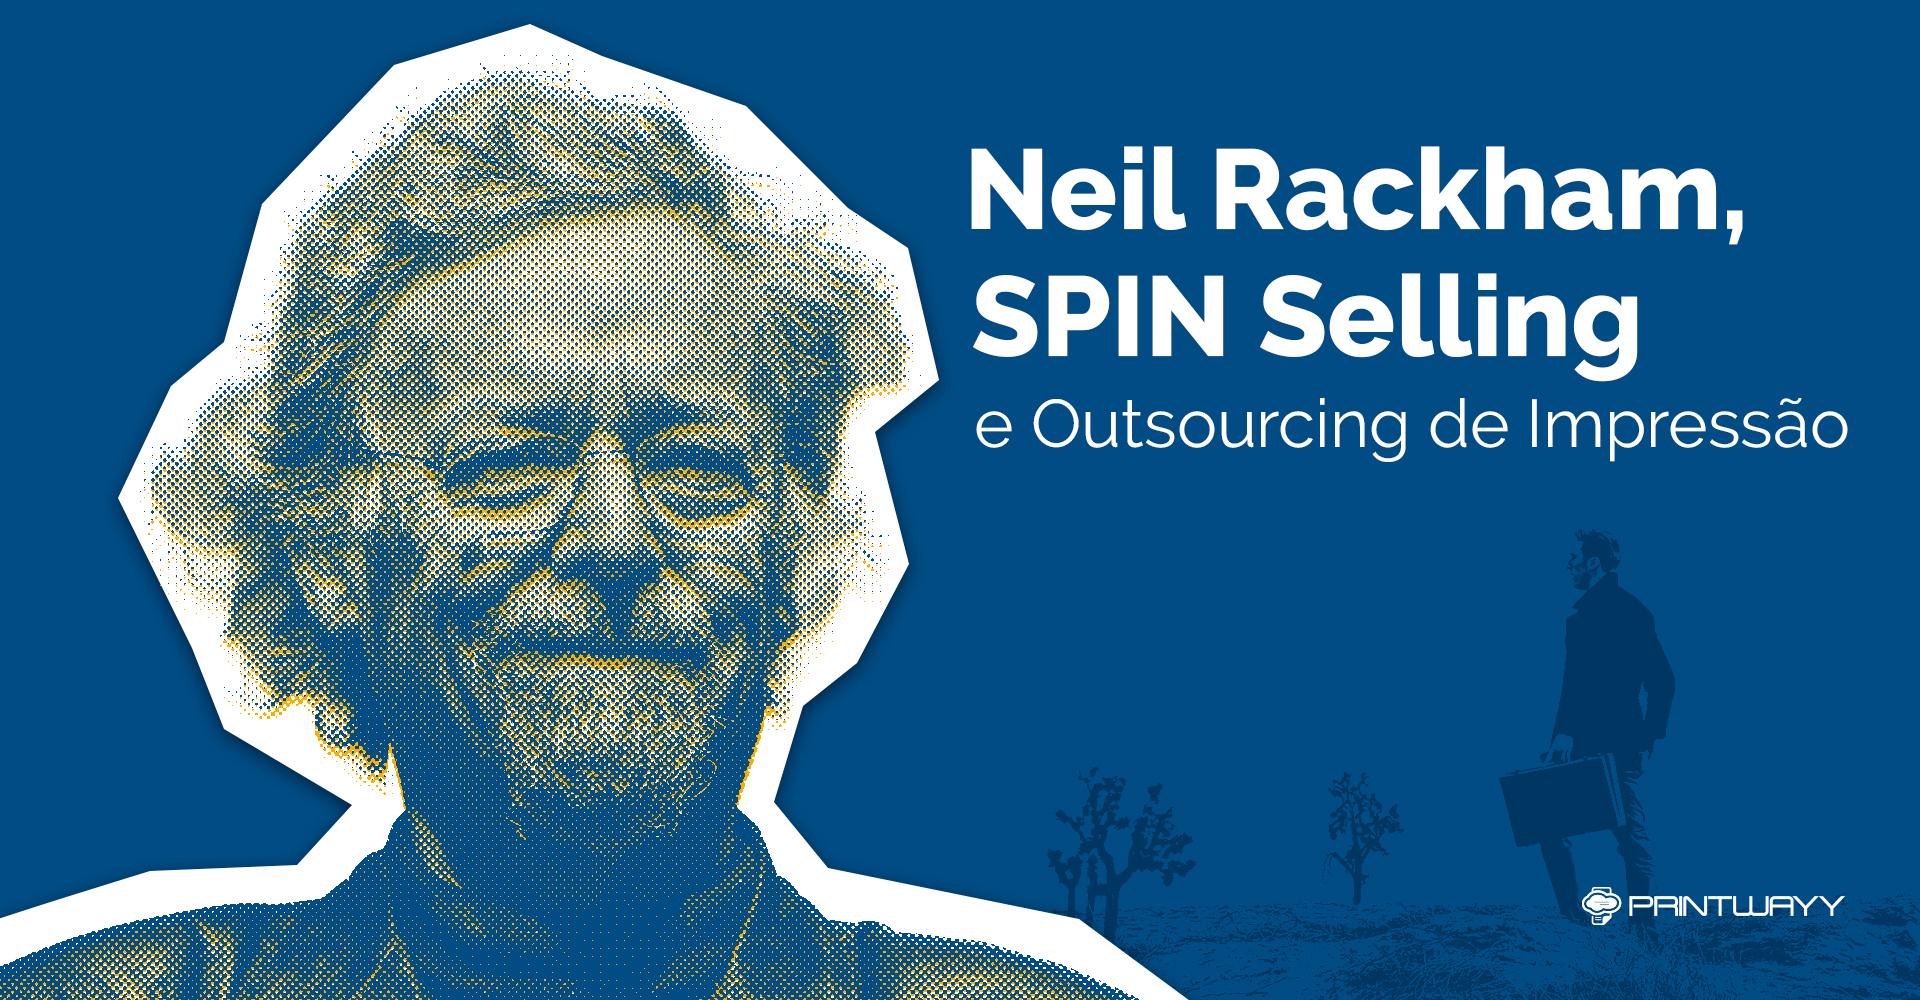 Neil Rackham, SPIN Selling e Outsourcing de Impressão